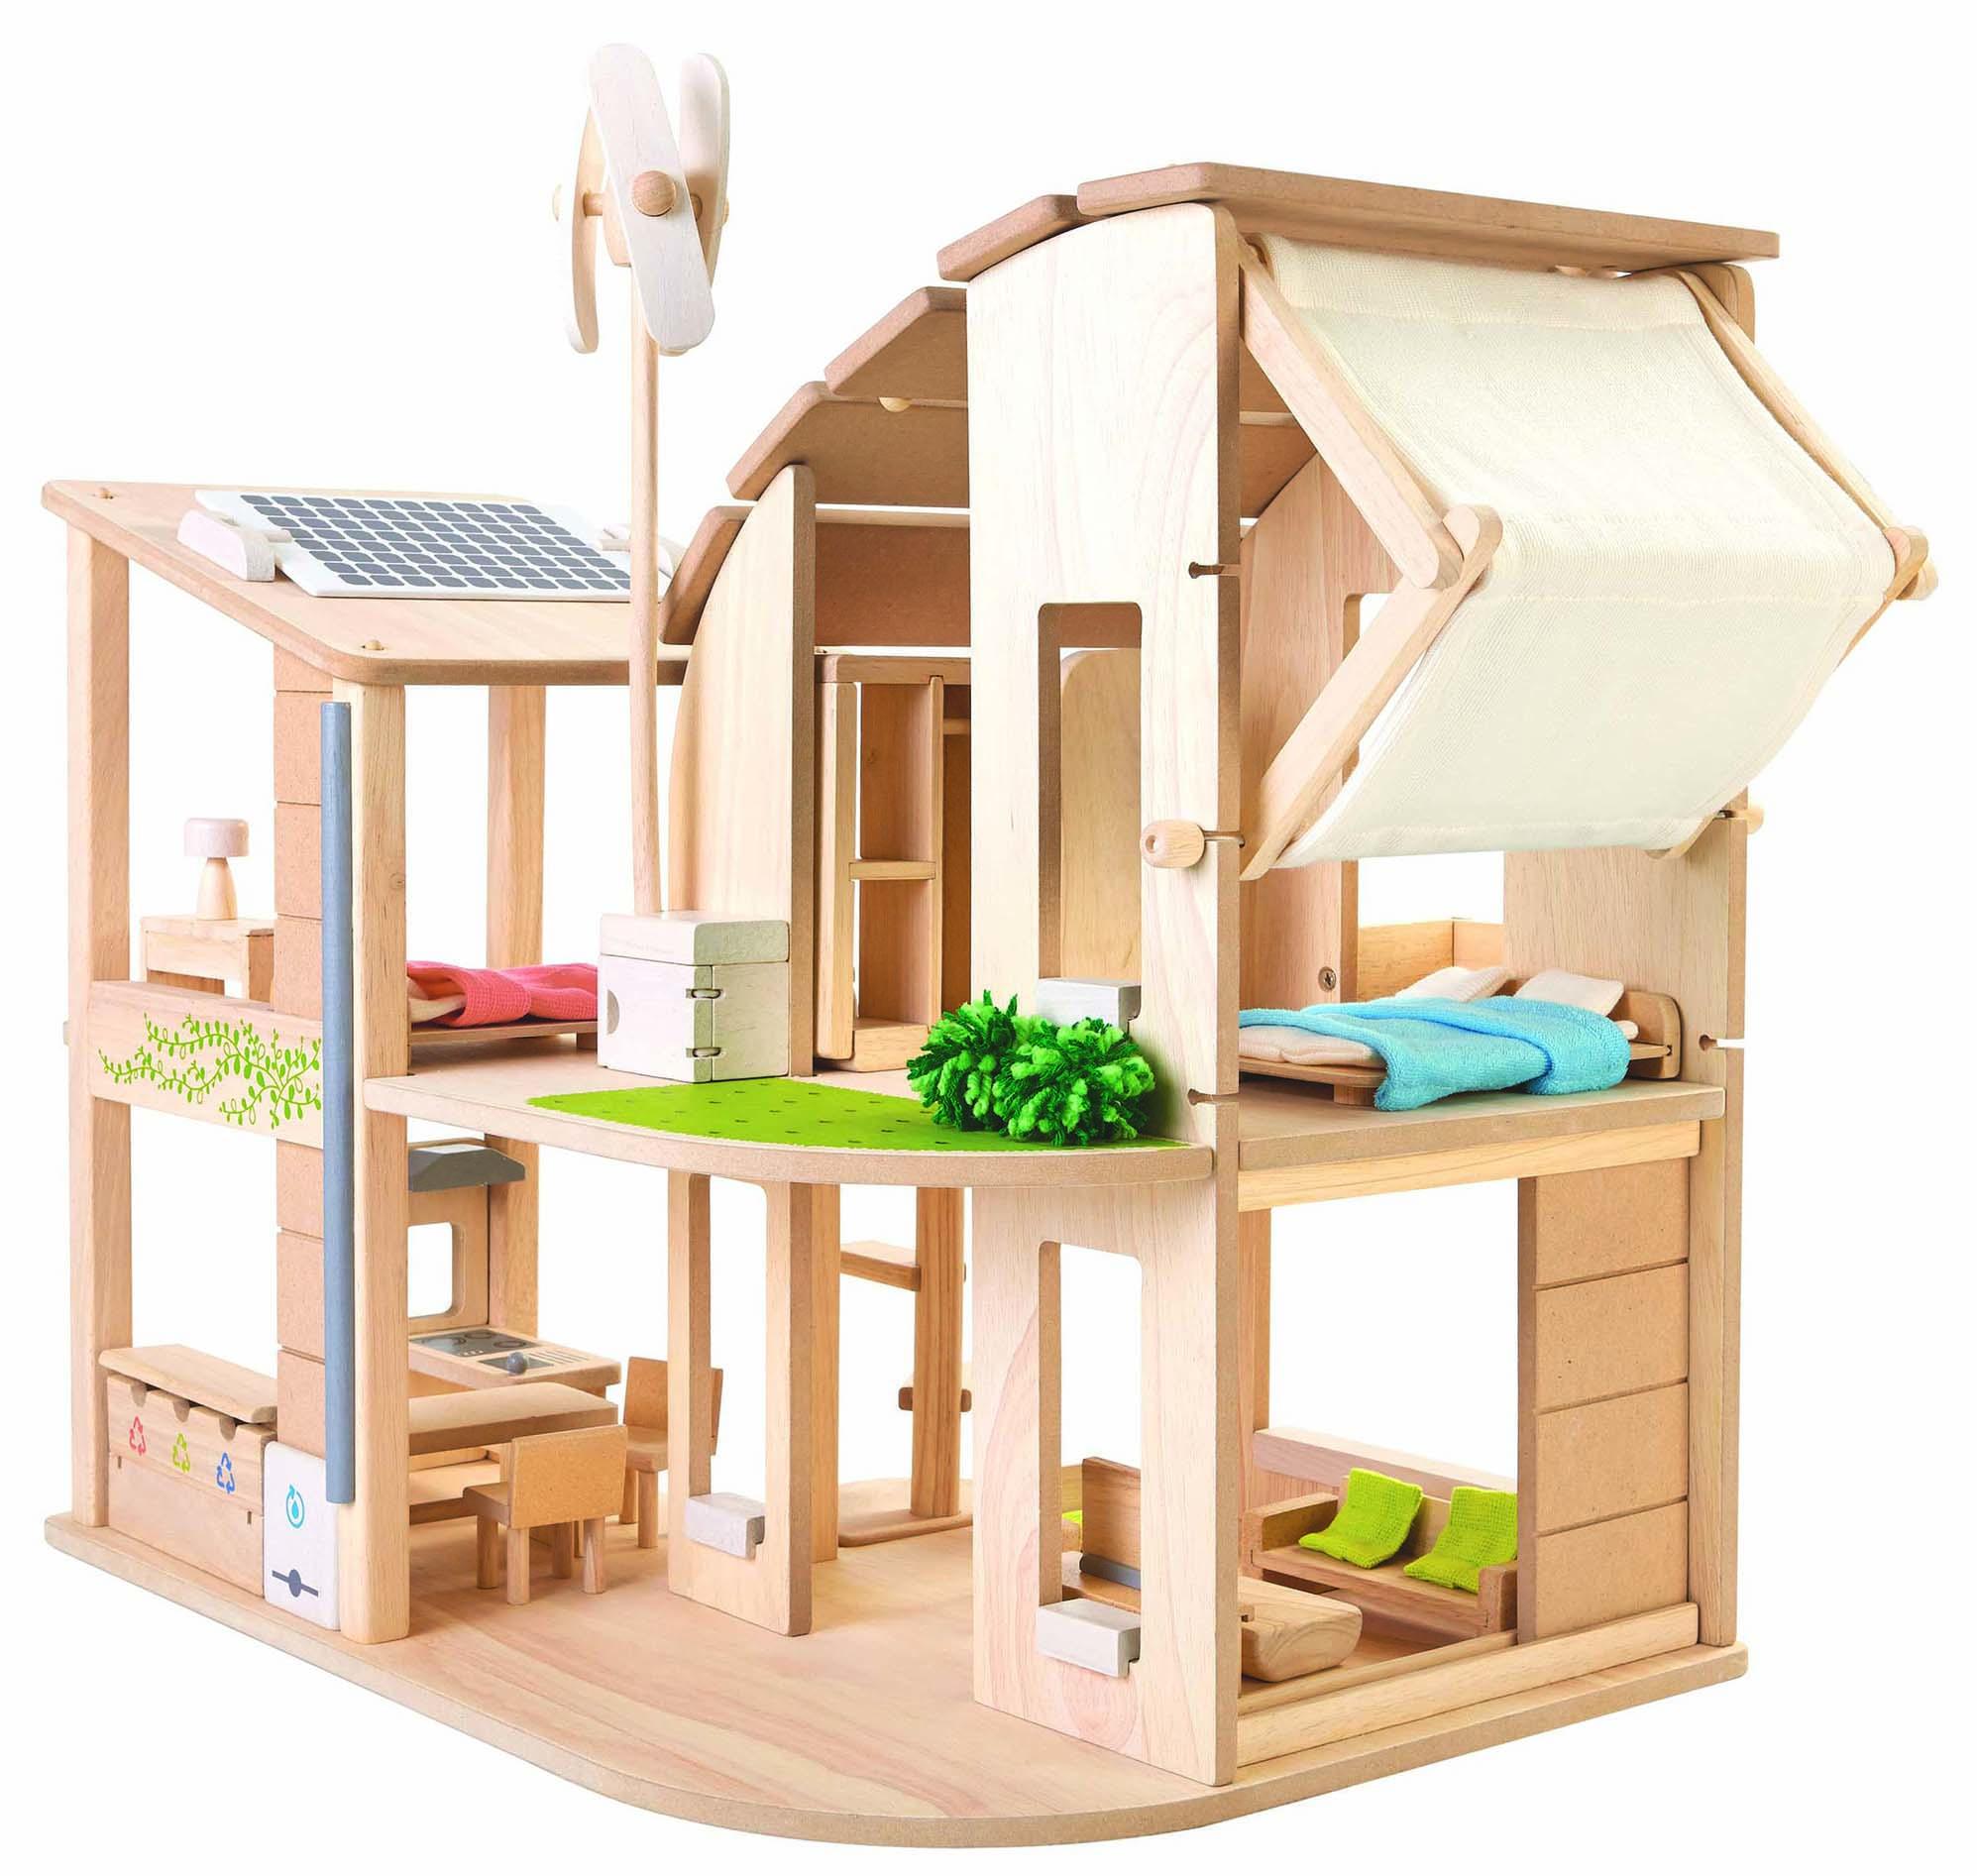 7156-green-dolls-house-furniture